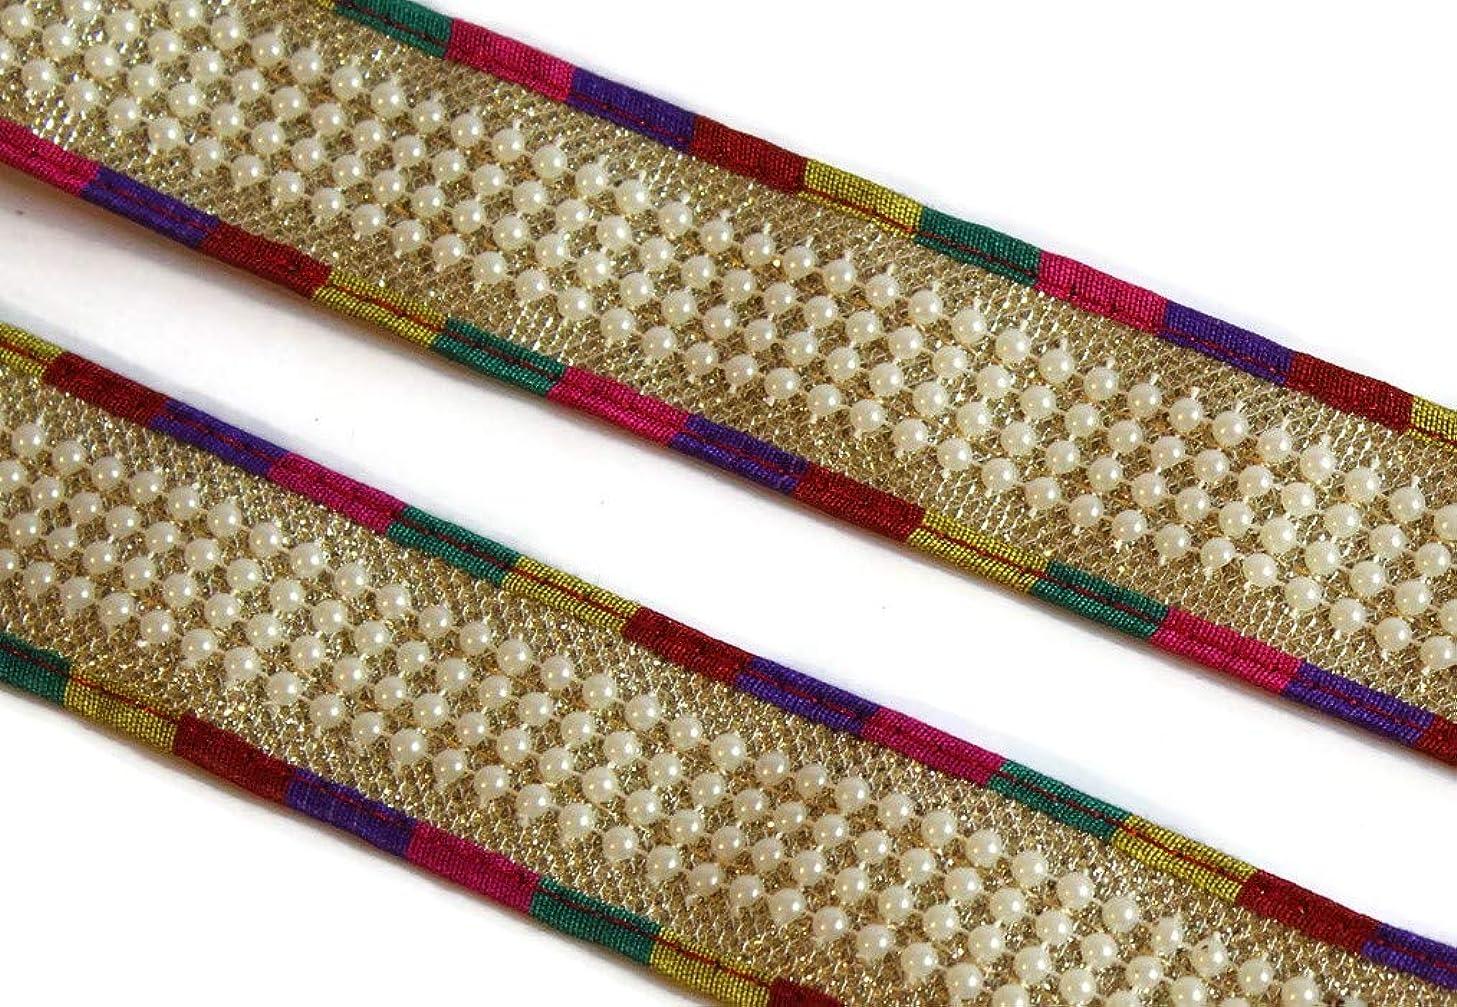 Indian Pearl Trim,Bridal Applique,Sash Applique,Wide Sari Lace,Bridal Lace-Width 03 cm-Price for 1 Yard-IDL12